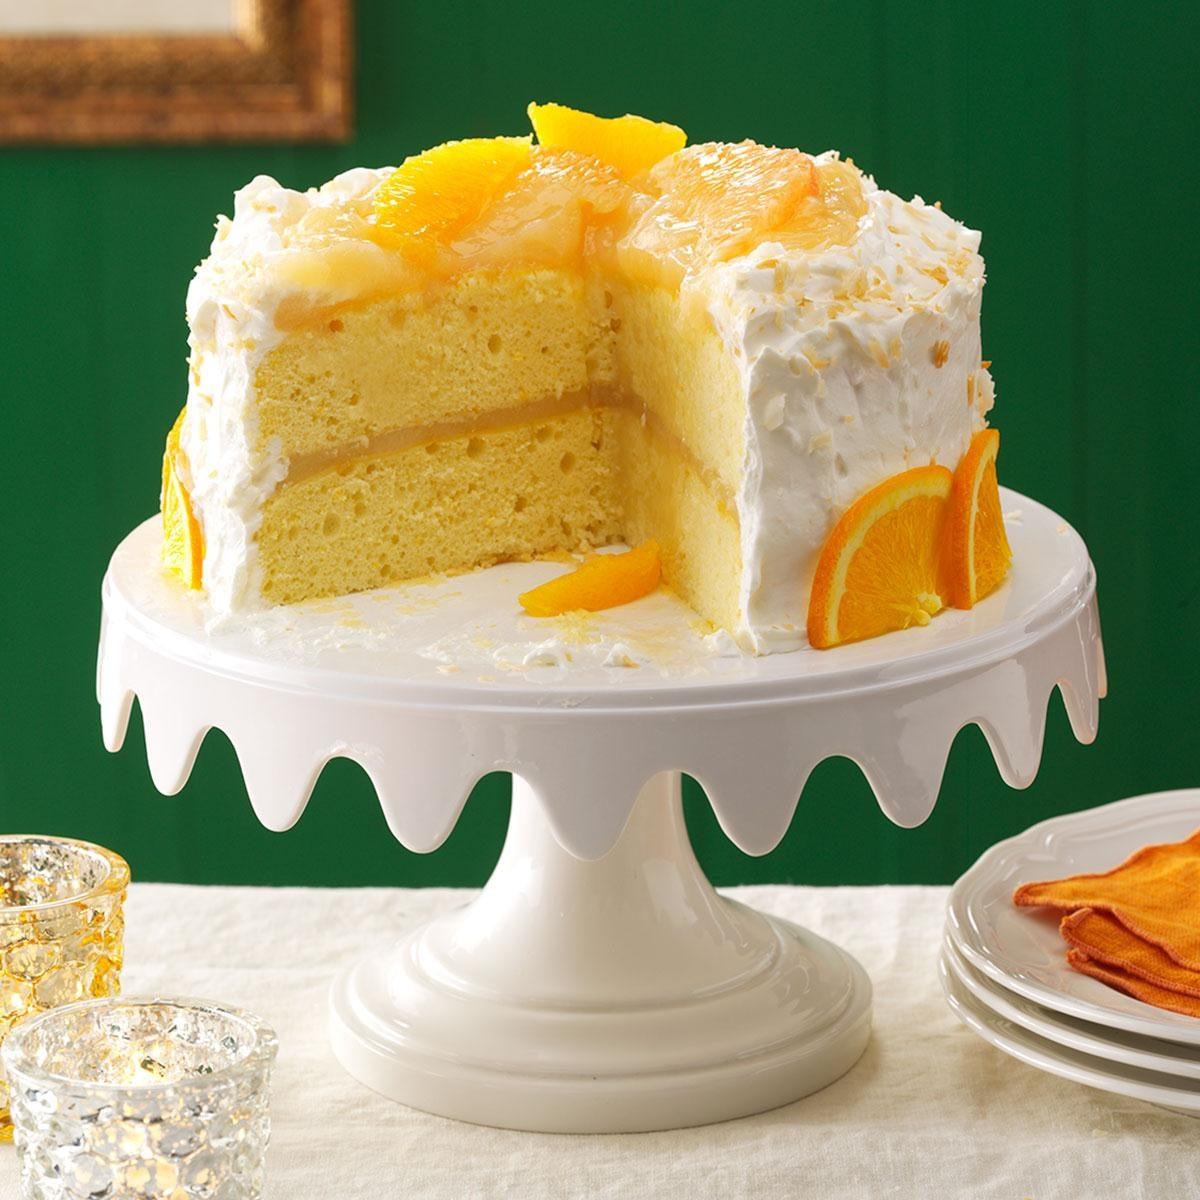 Layered Birthday Cake Recipes  12 Months of Birthday Cake Recipes